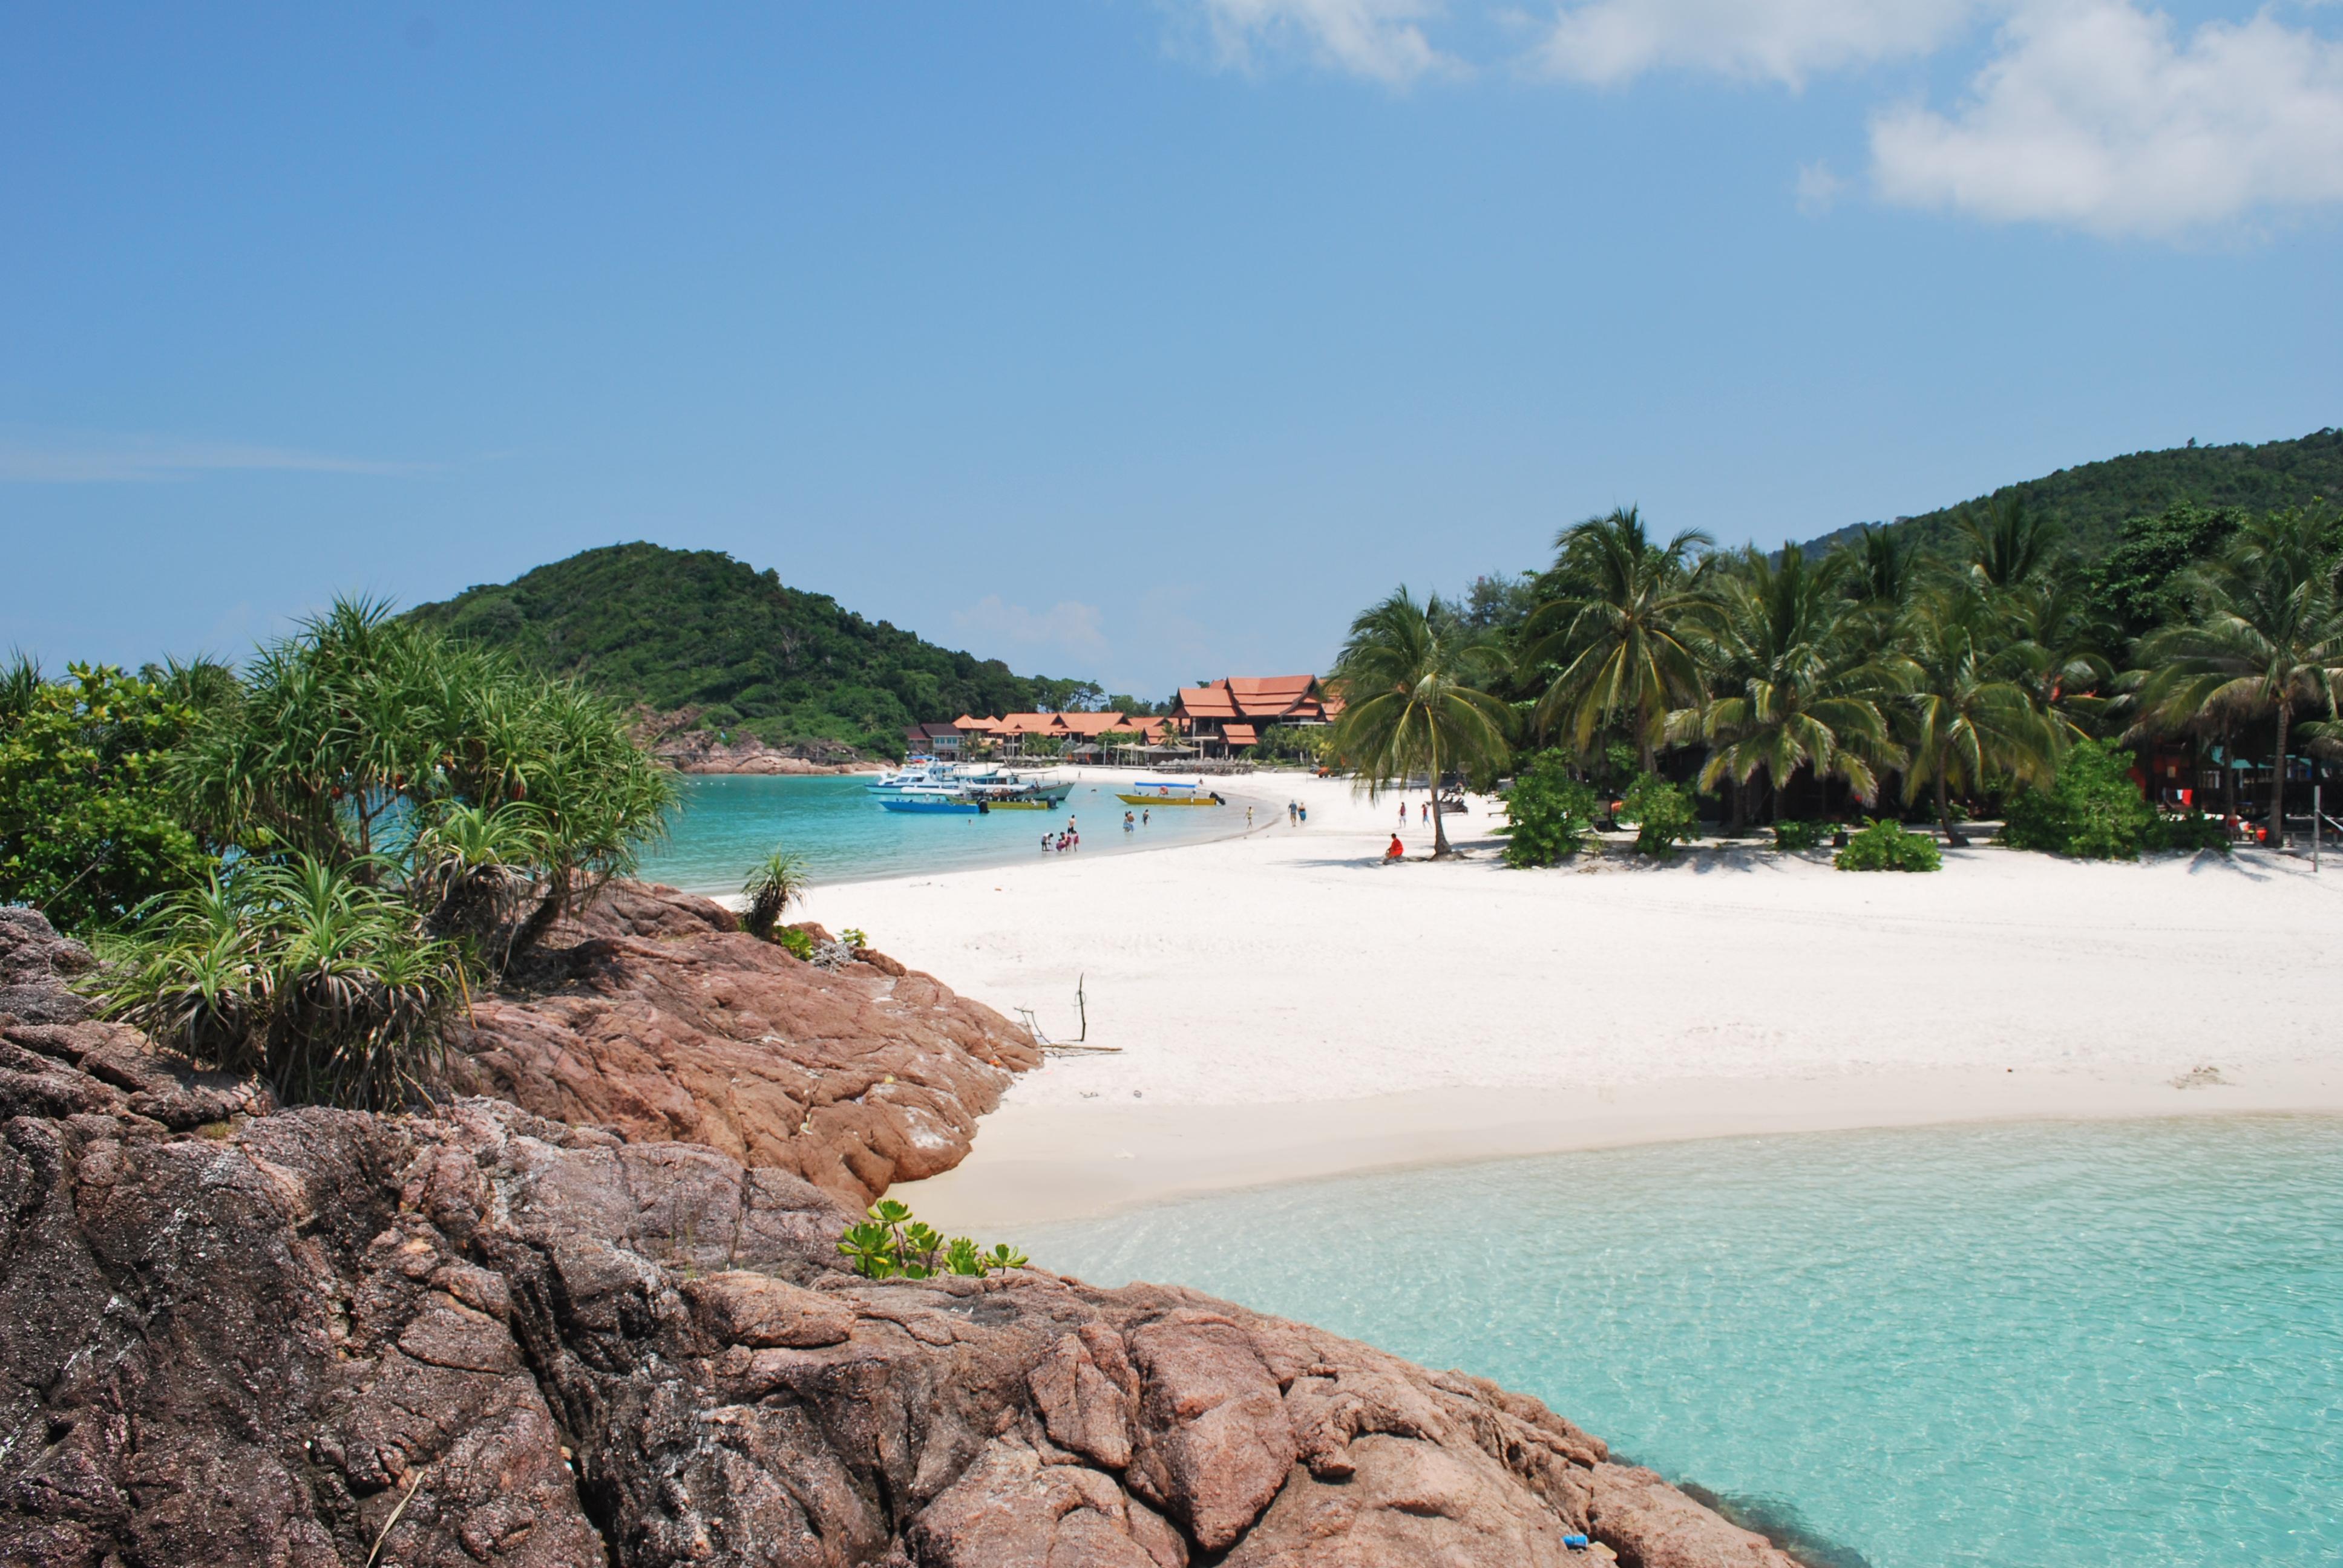 file:redang sea beach - wikimedia commons